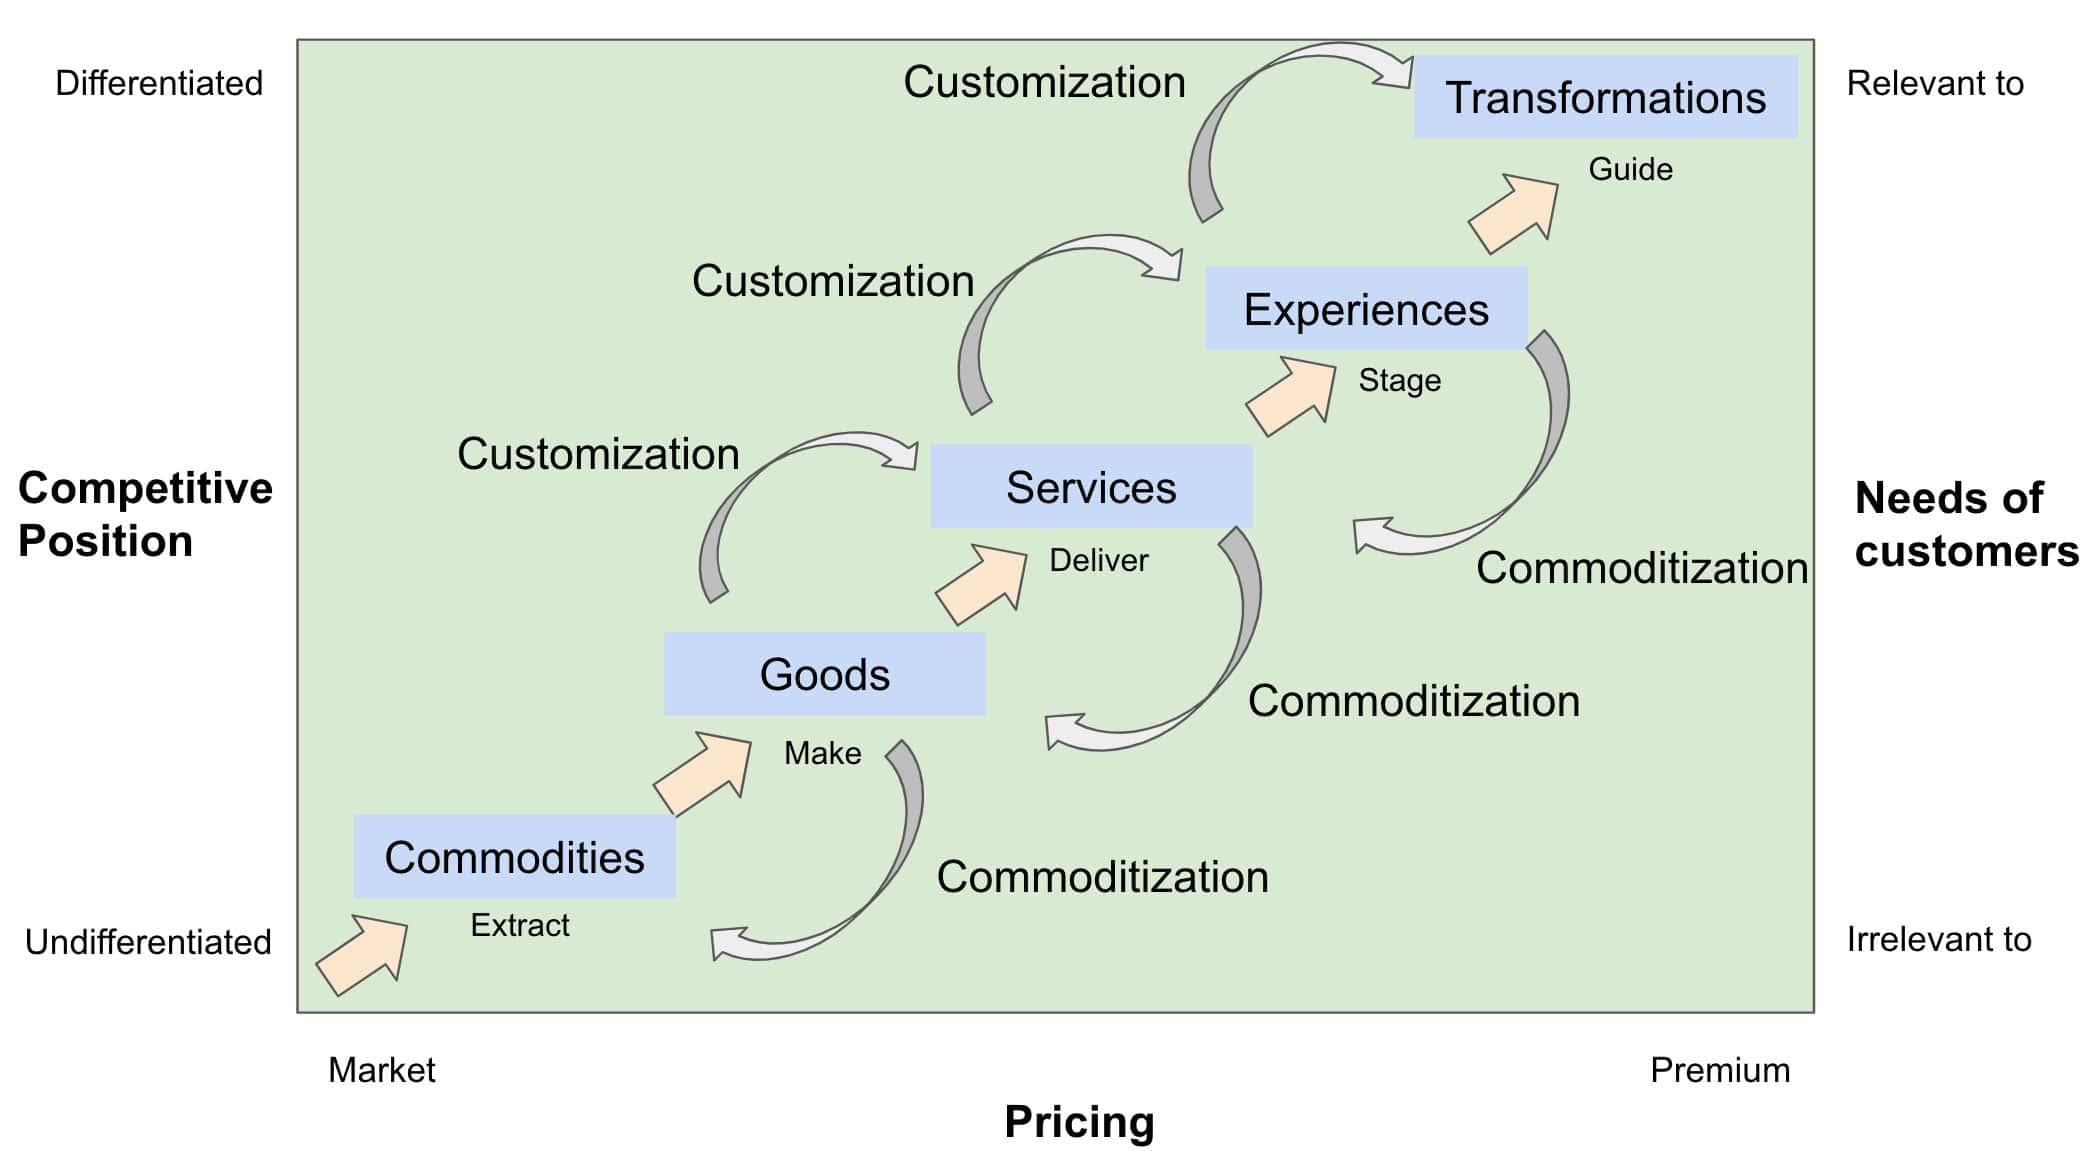 pine en gilmore transformations progression of economic value model